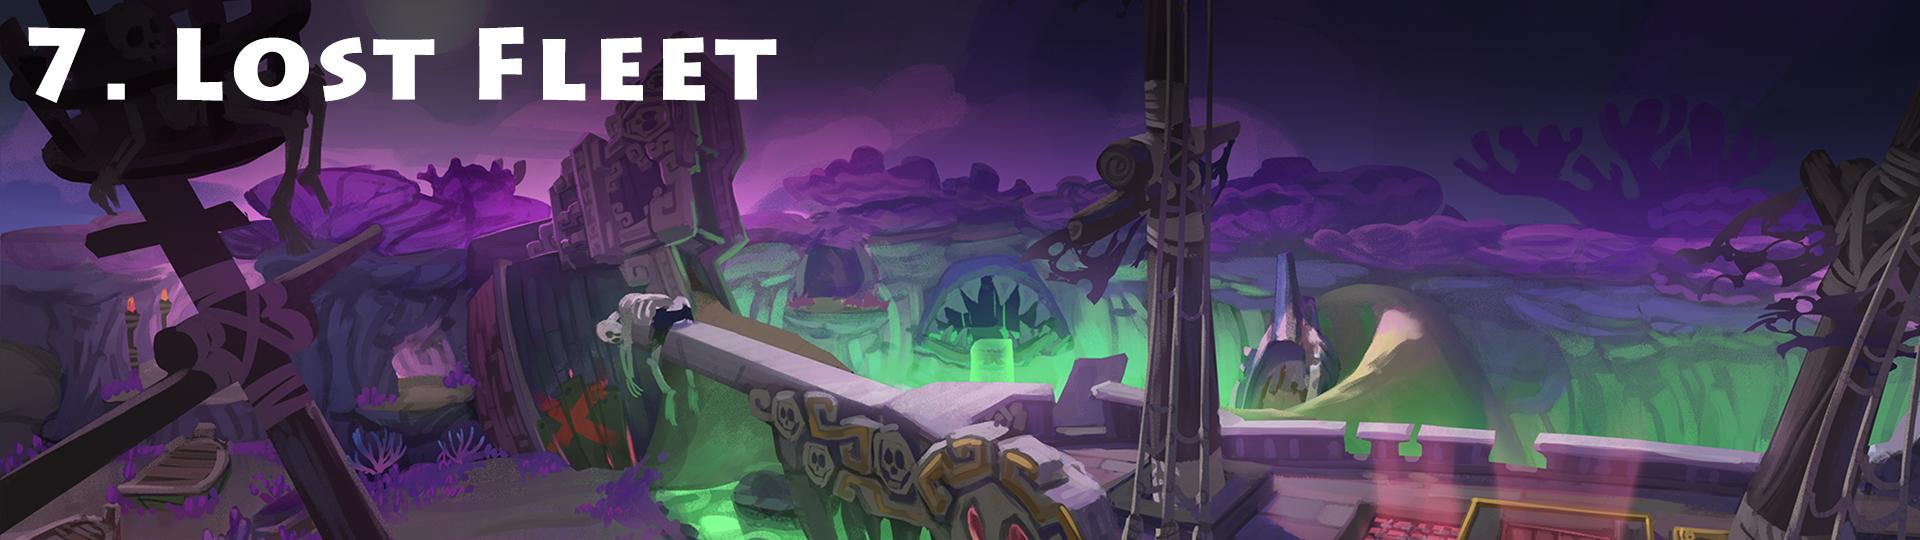 7. Lost Fleet